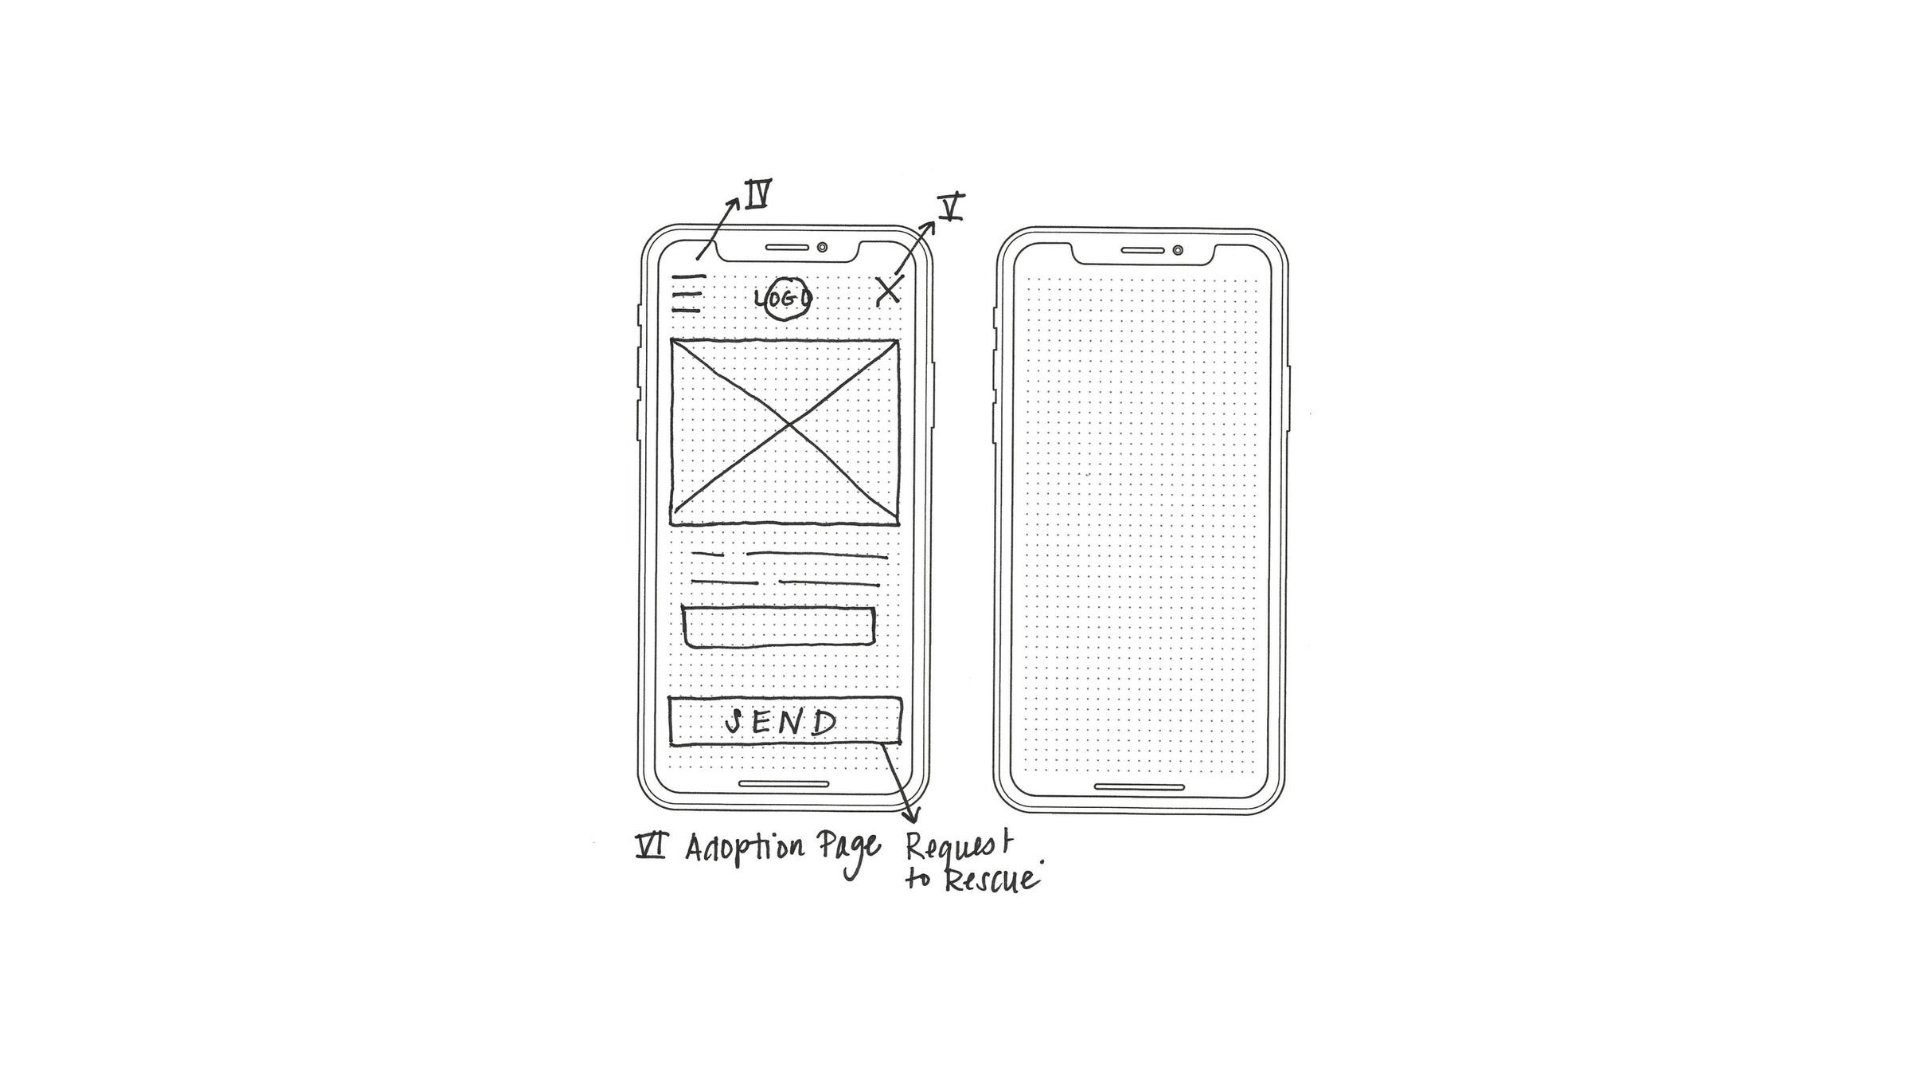 Digital UX — HAILEY ERIN YEAGER